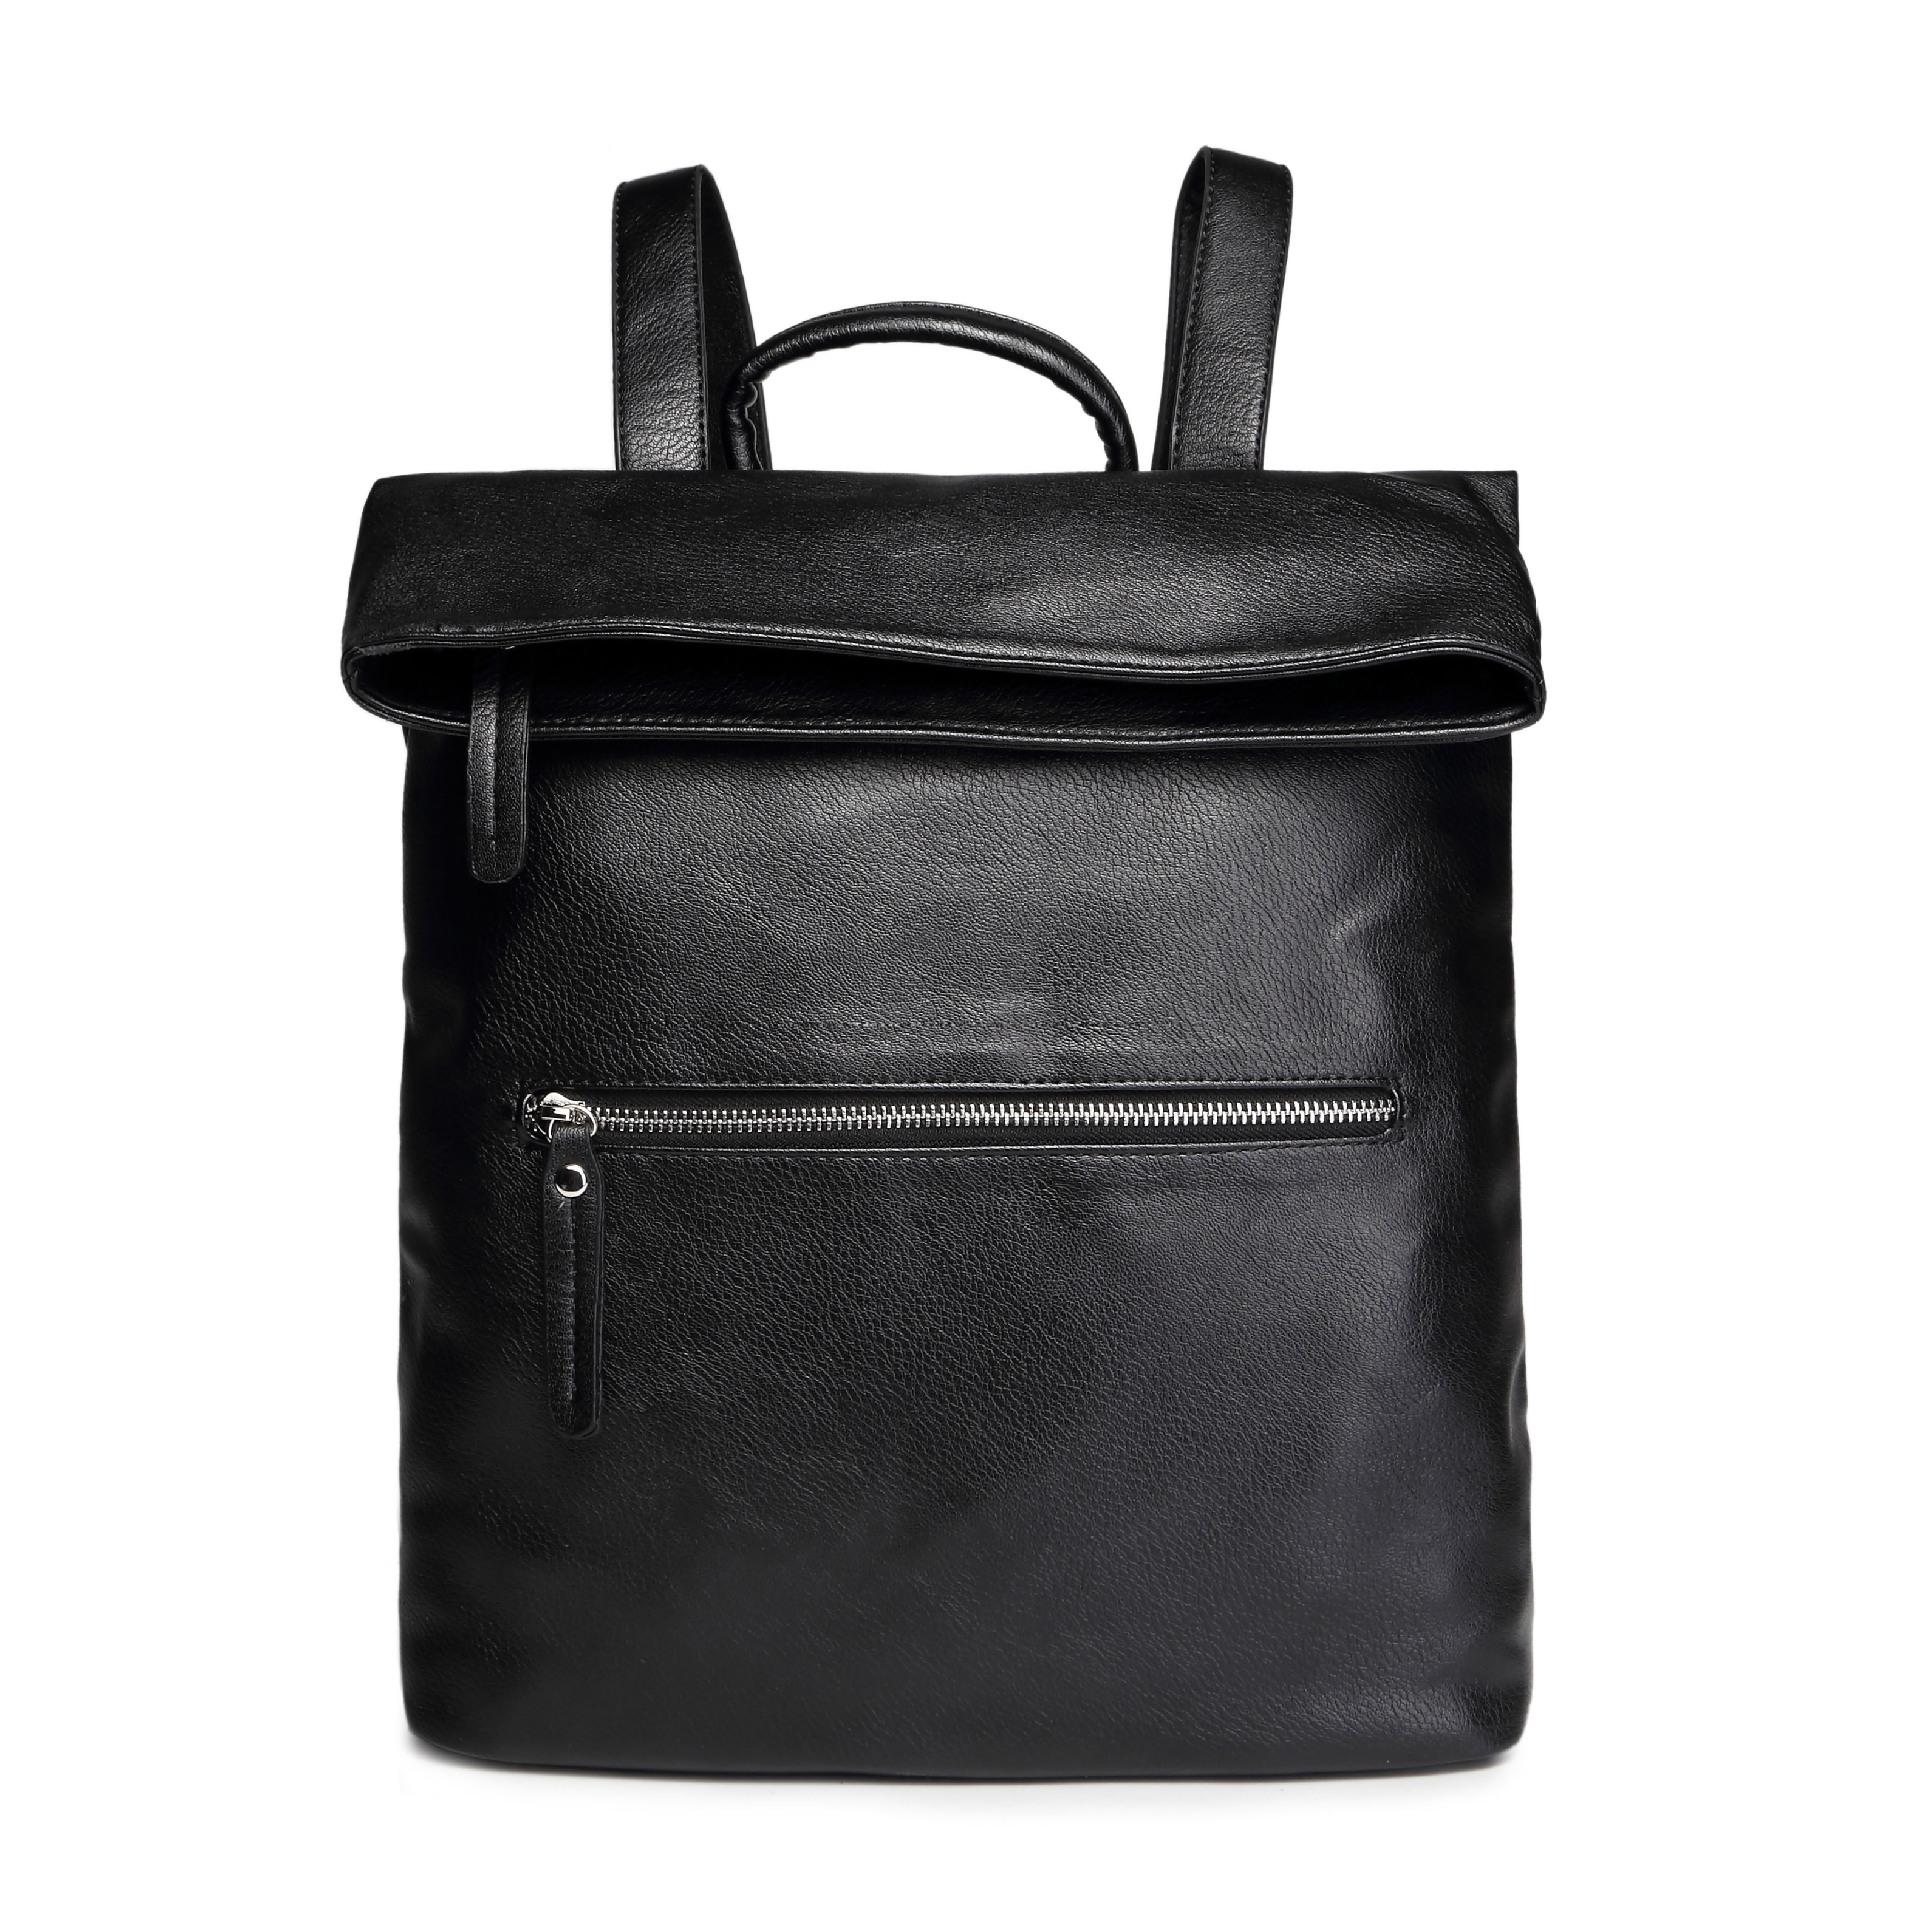 Simple Style Designer Small Backpack Women Black Travel PU Leather Ladies Backpacks Fashion Female Back Bags Shoulder Bag(China (Mainland))